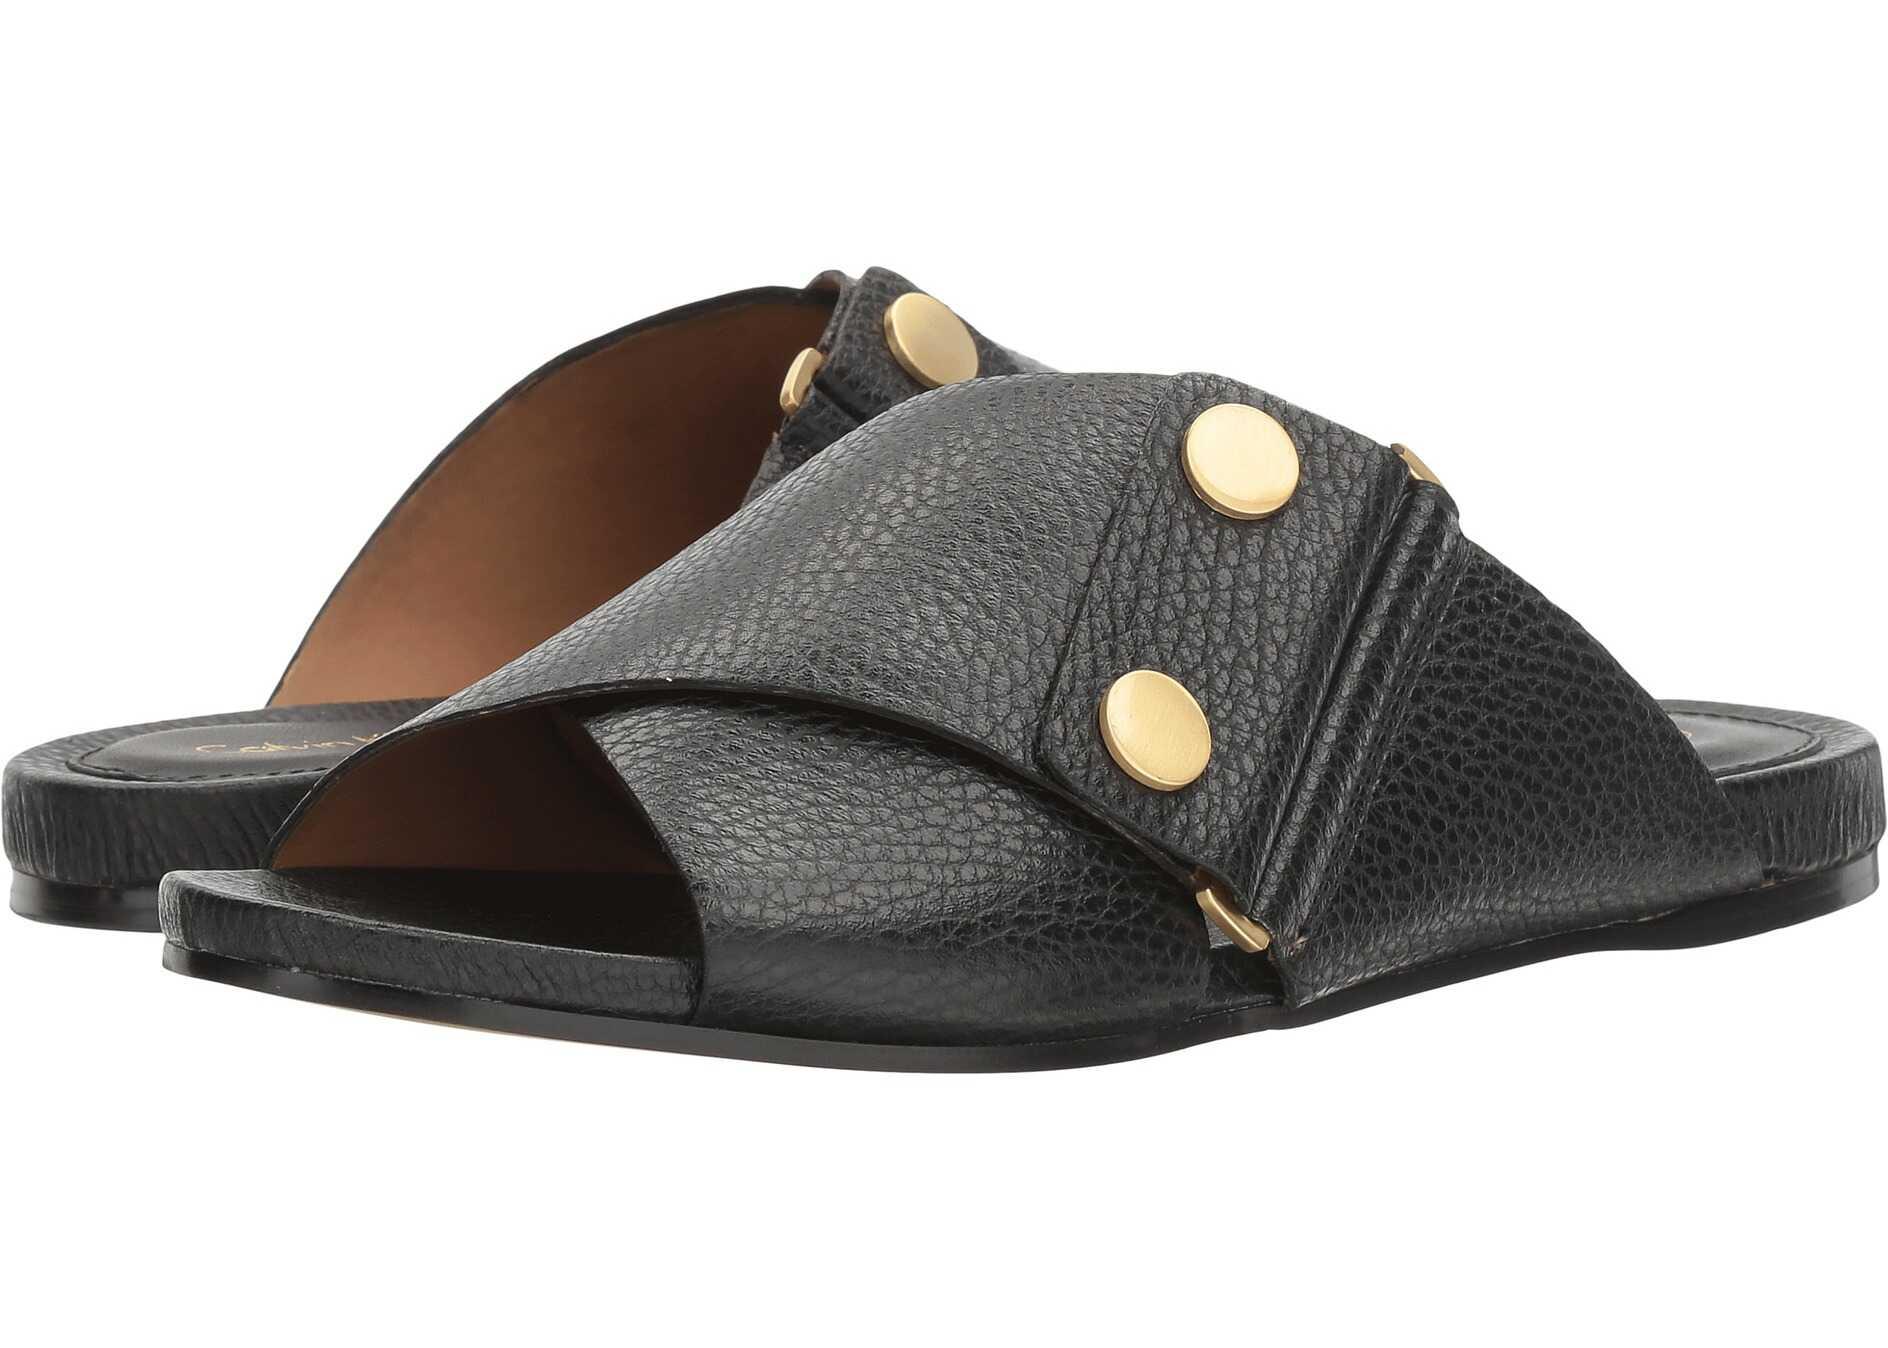 Sandale Femei Calvin Klein Pamice Black Leather